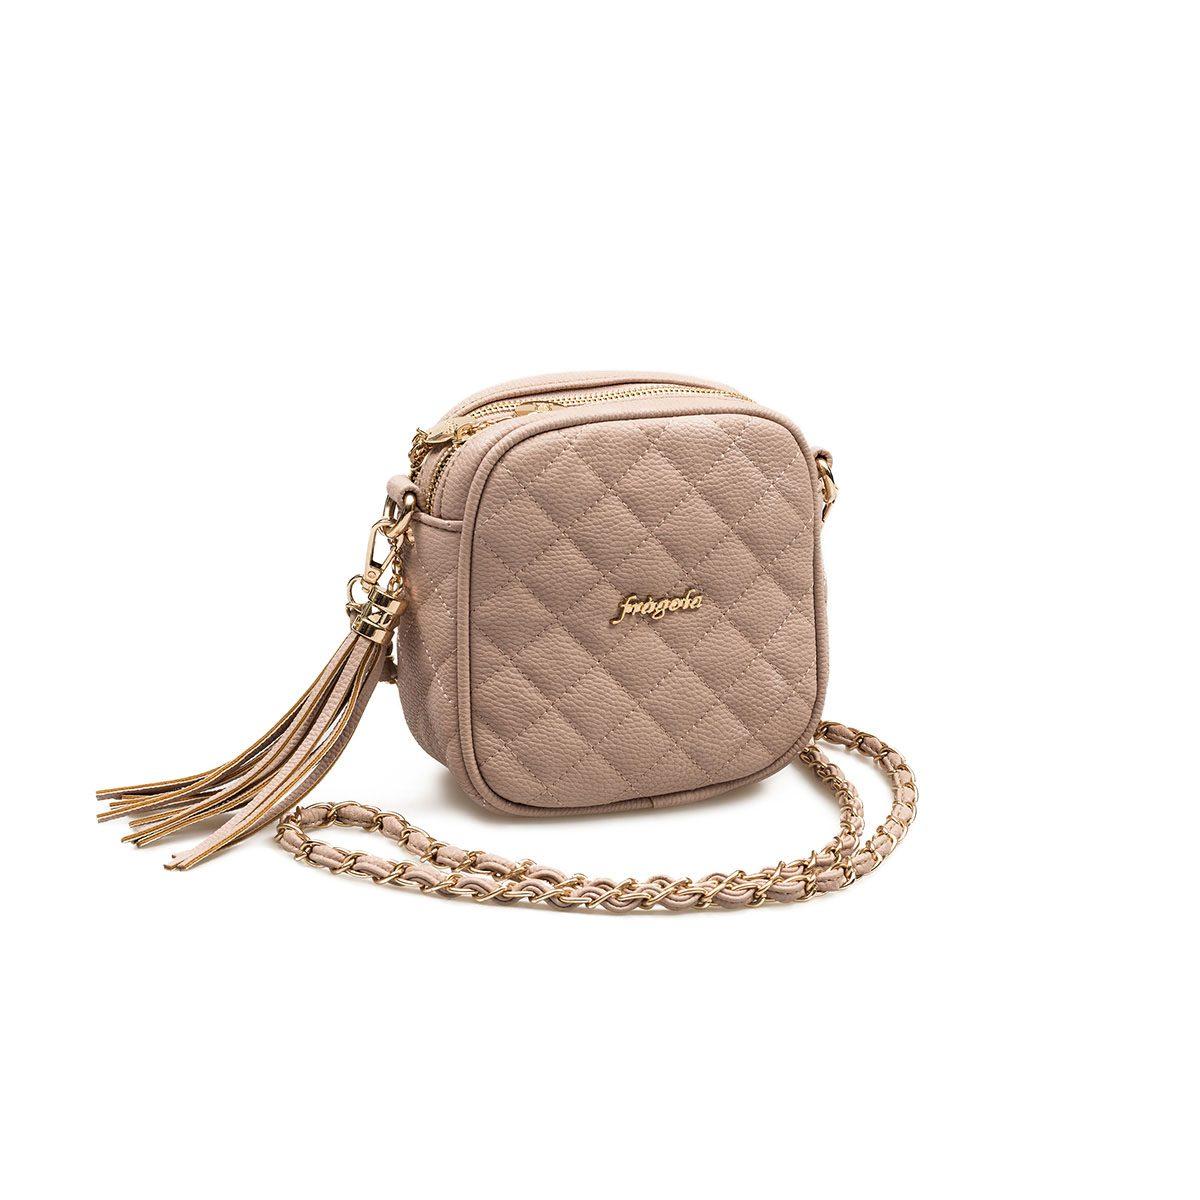 f2d2a356a6 Τσάντα Χιαστί Fragola 008 Ροζ Nude με Αλυσίδα